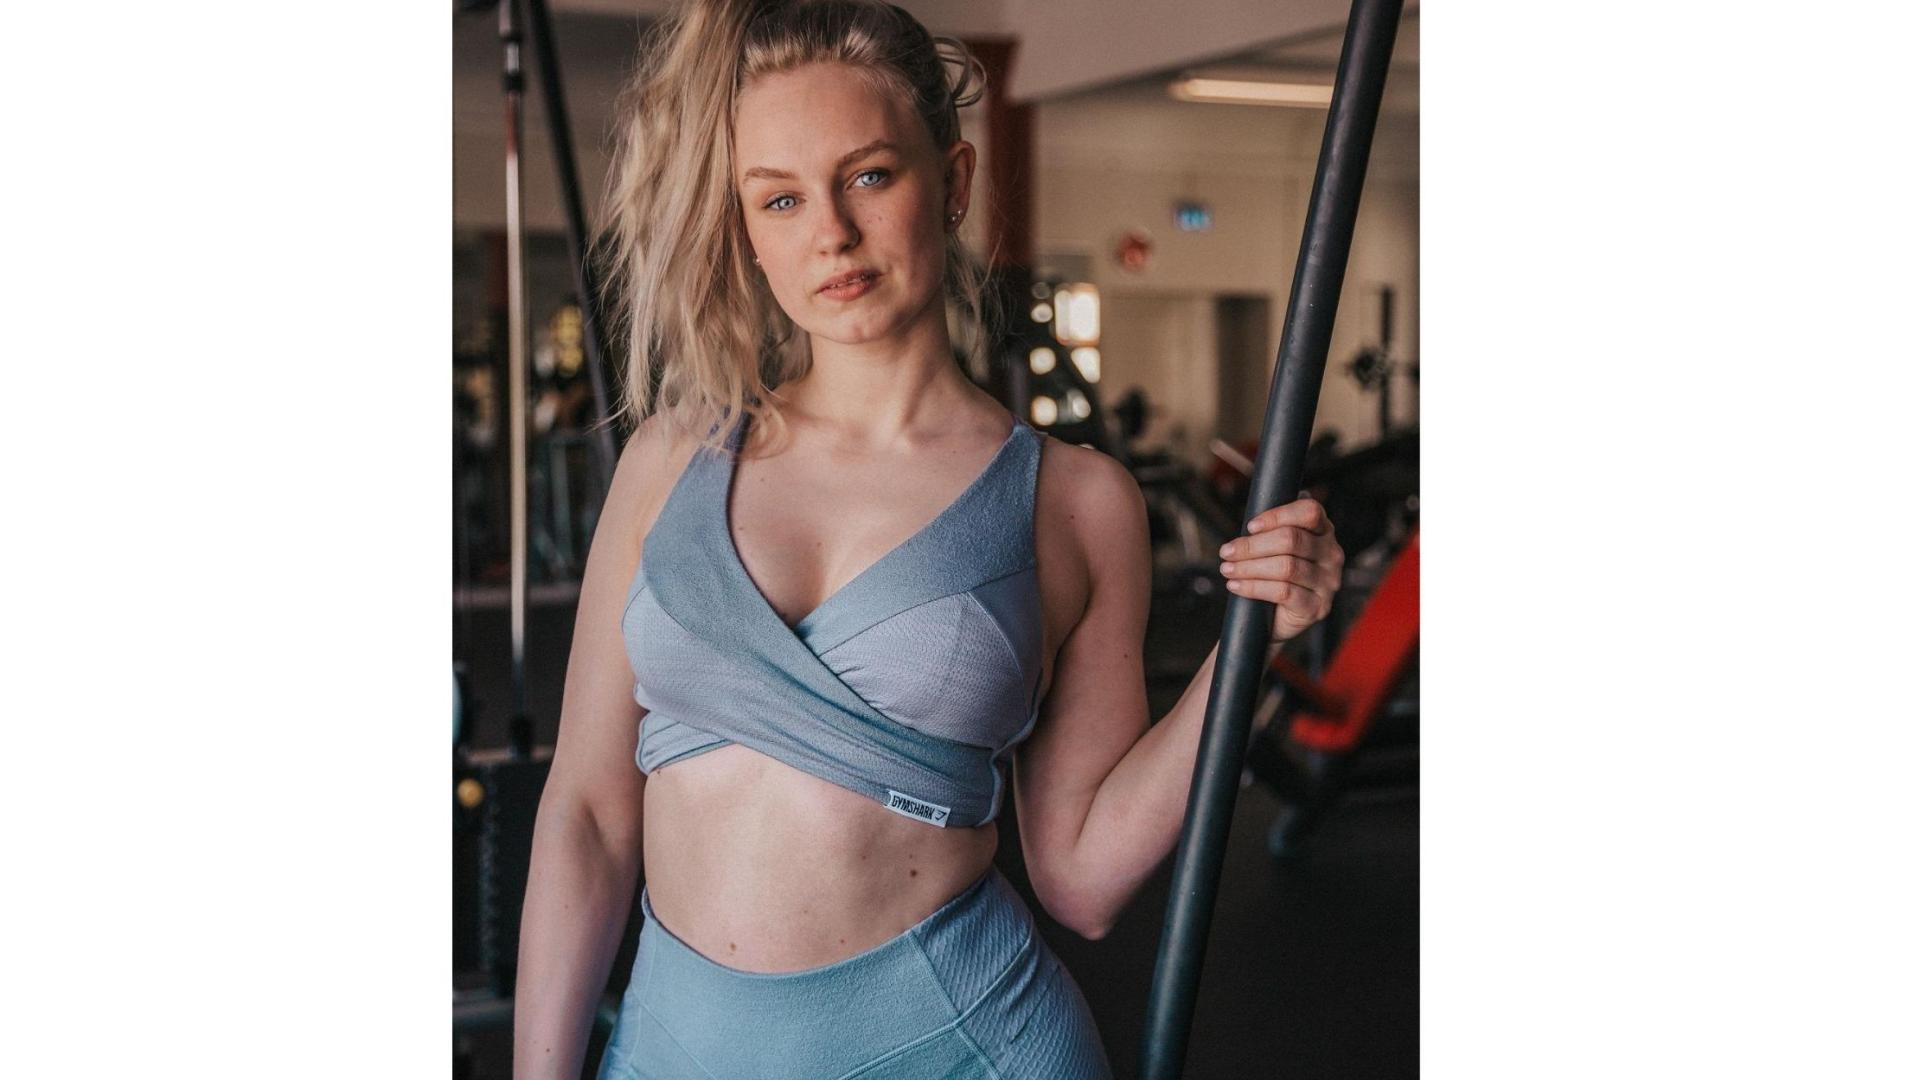 Carina Møller-Mikkelsen, Fitness, Curvy, Curvymodel, Model